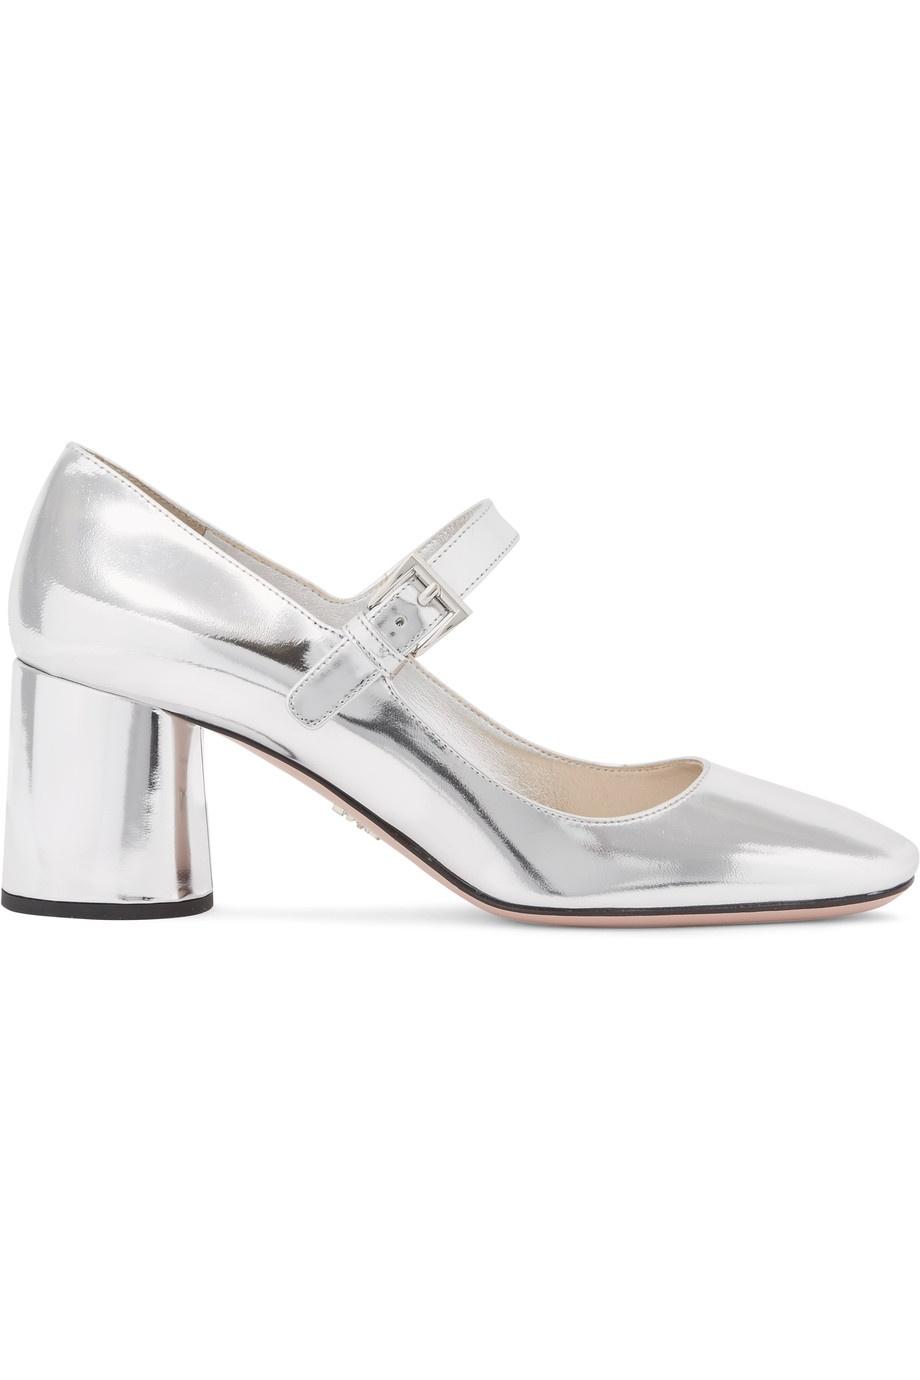 PRADA Metallic leather Mary Jane pumps